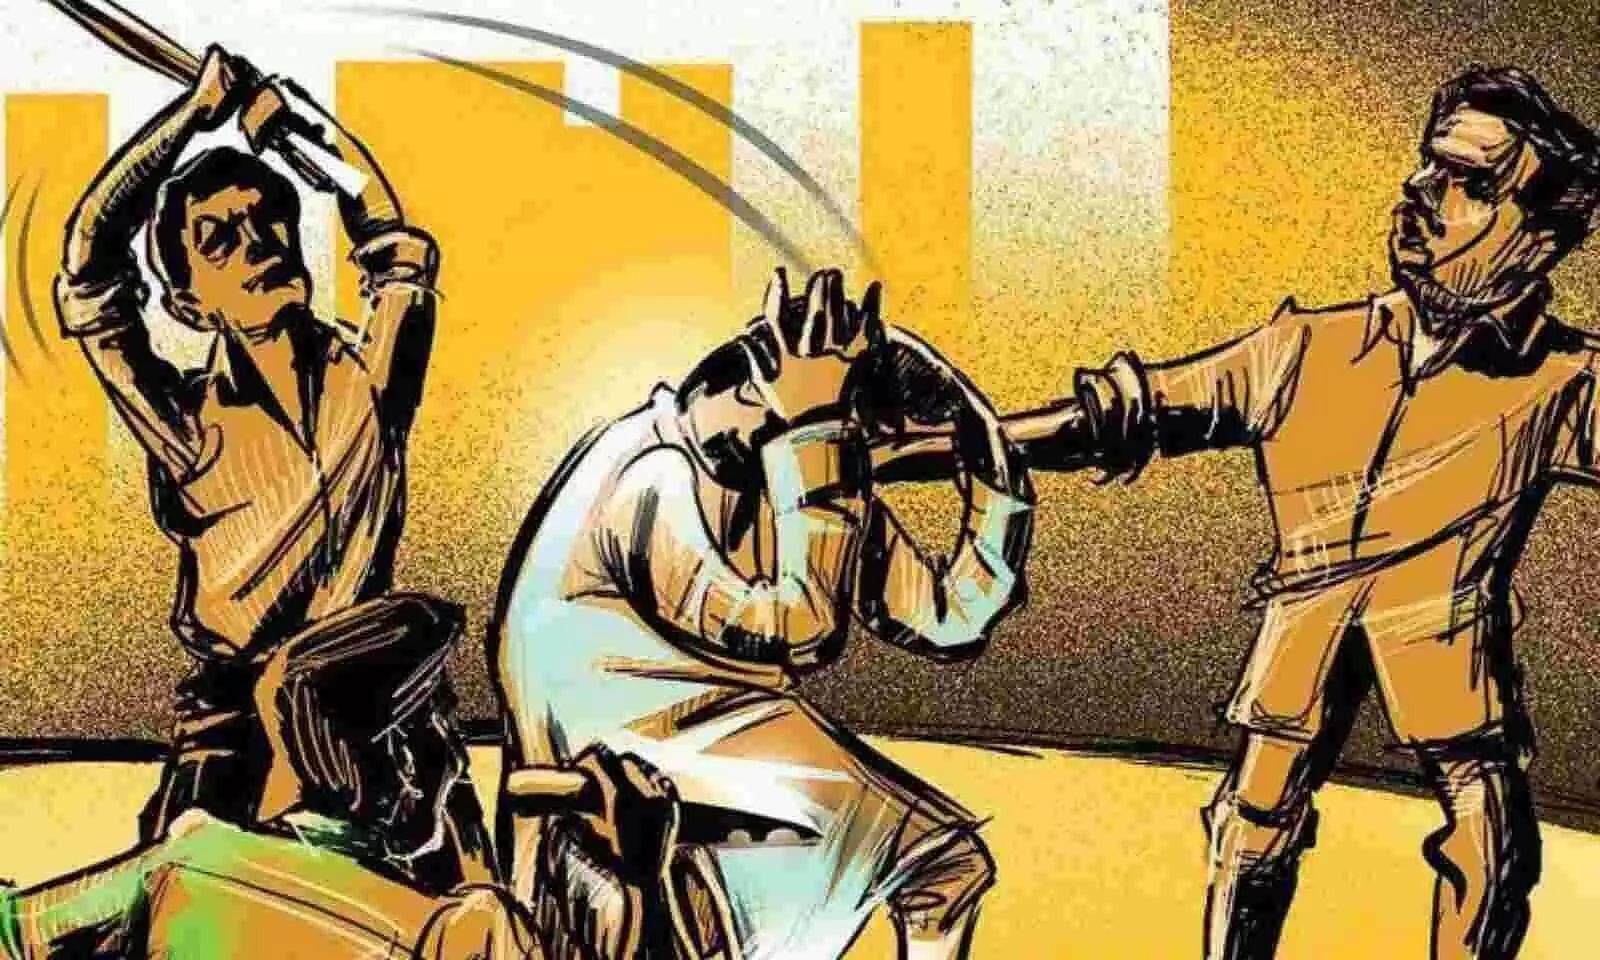 Post Graduate Students Union, Gauhati University condemns lynching of Debashish Gogoi